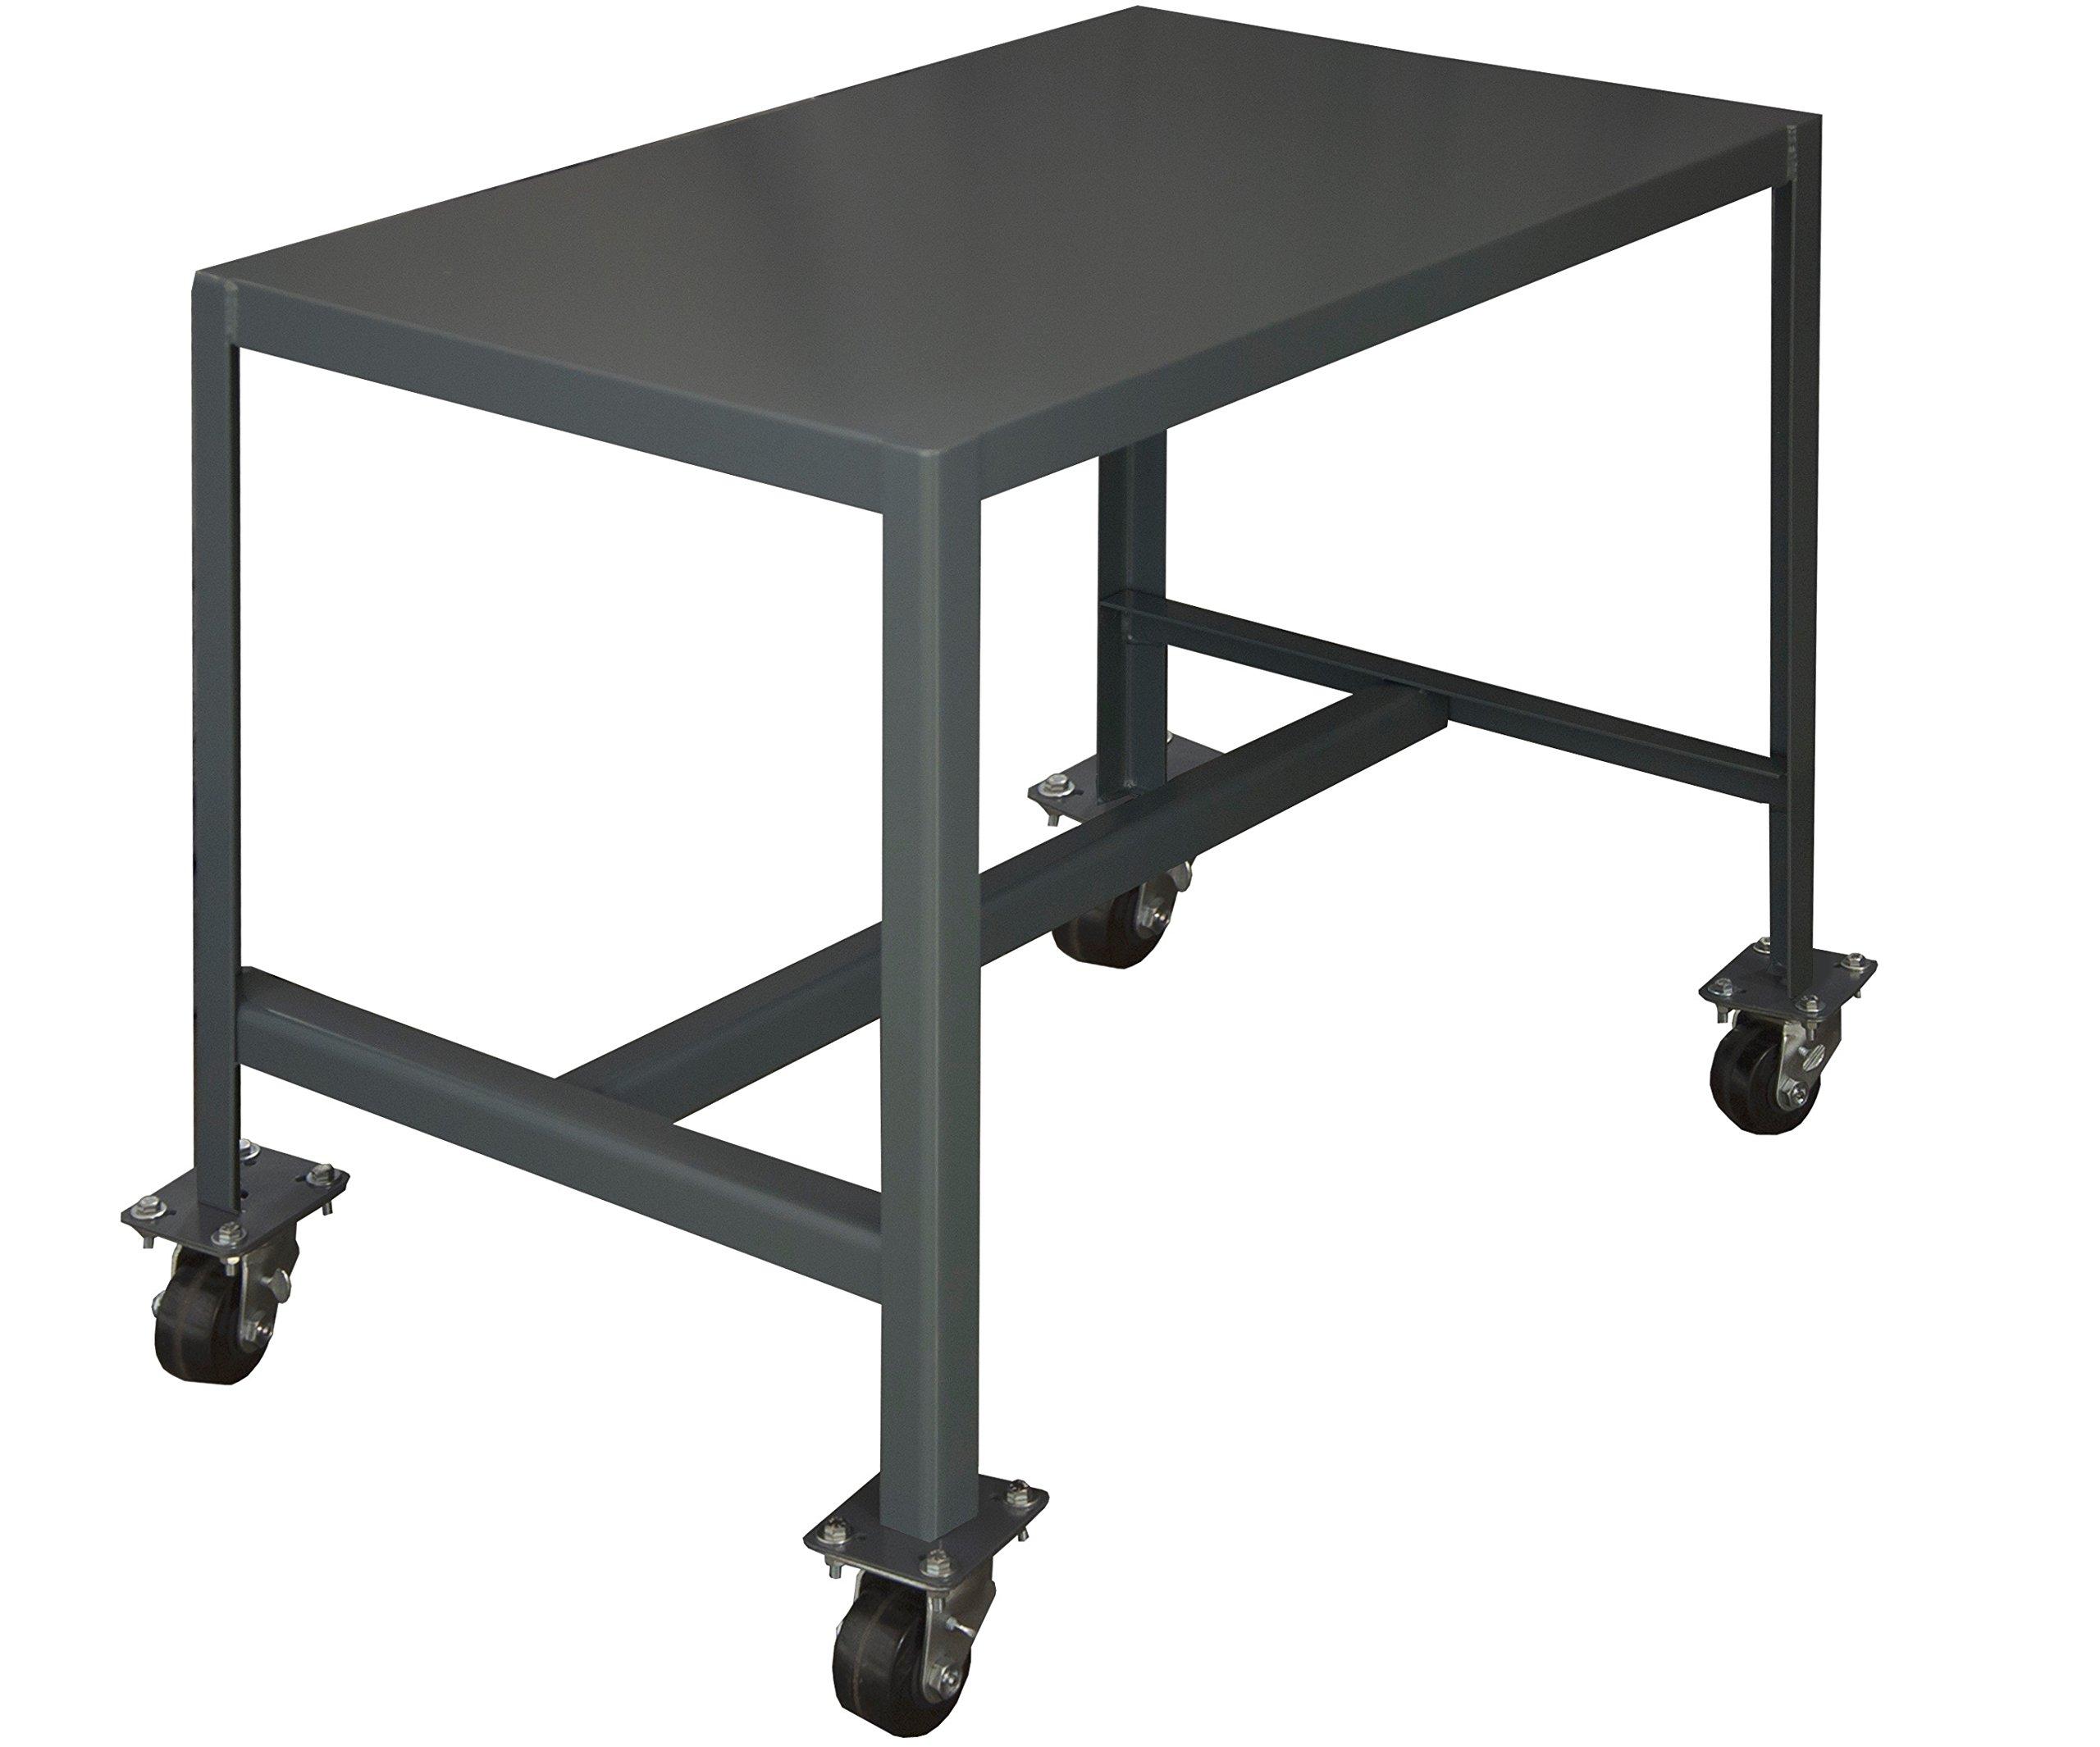 Durham Steel Mobile Medium Duty Machine Table, MTM244842-2K195,  1 Shelves,  2000 lbs Capacity,  48'' Length x 24'' Width x 42'' Height